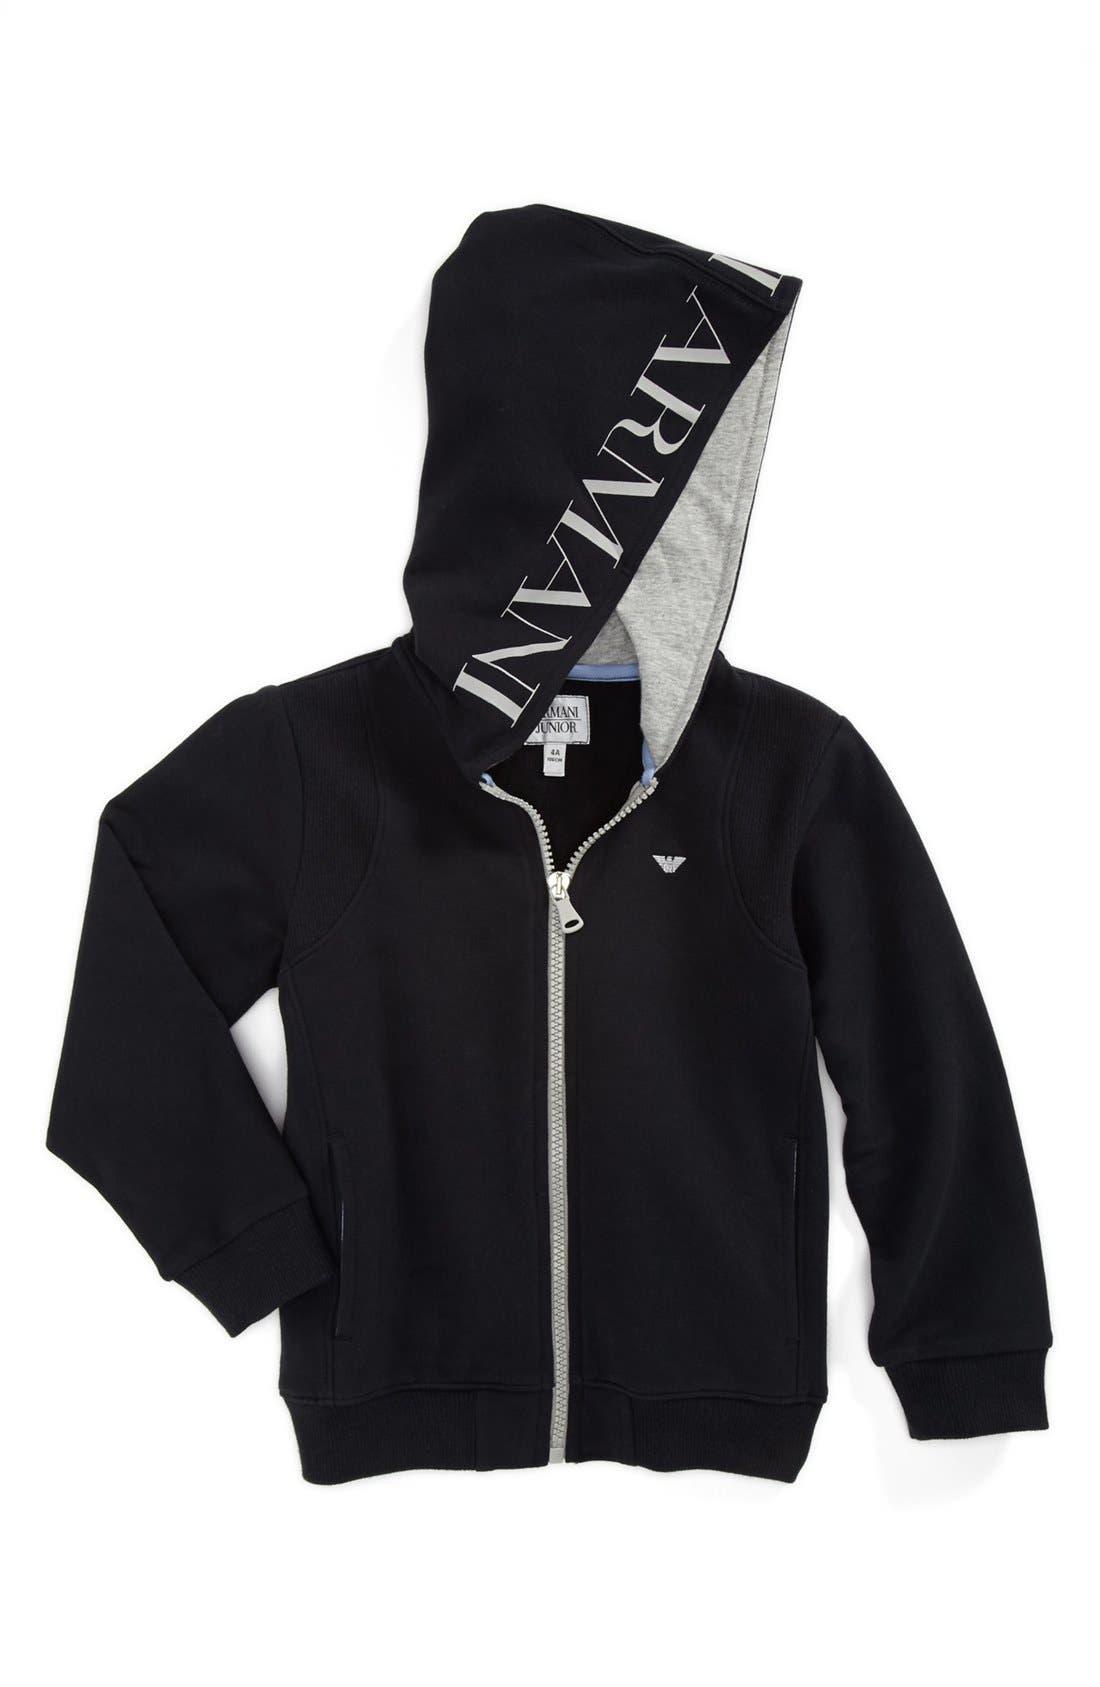 Alternate Image 1 Selected - Armani Junior Hooded Sweatshirt (Toddler Boys)